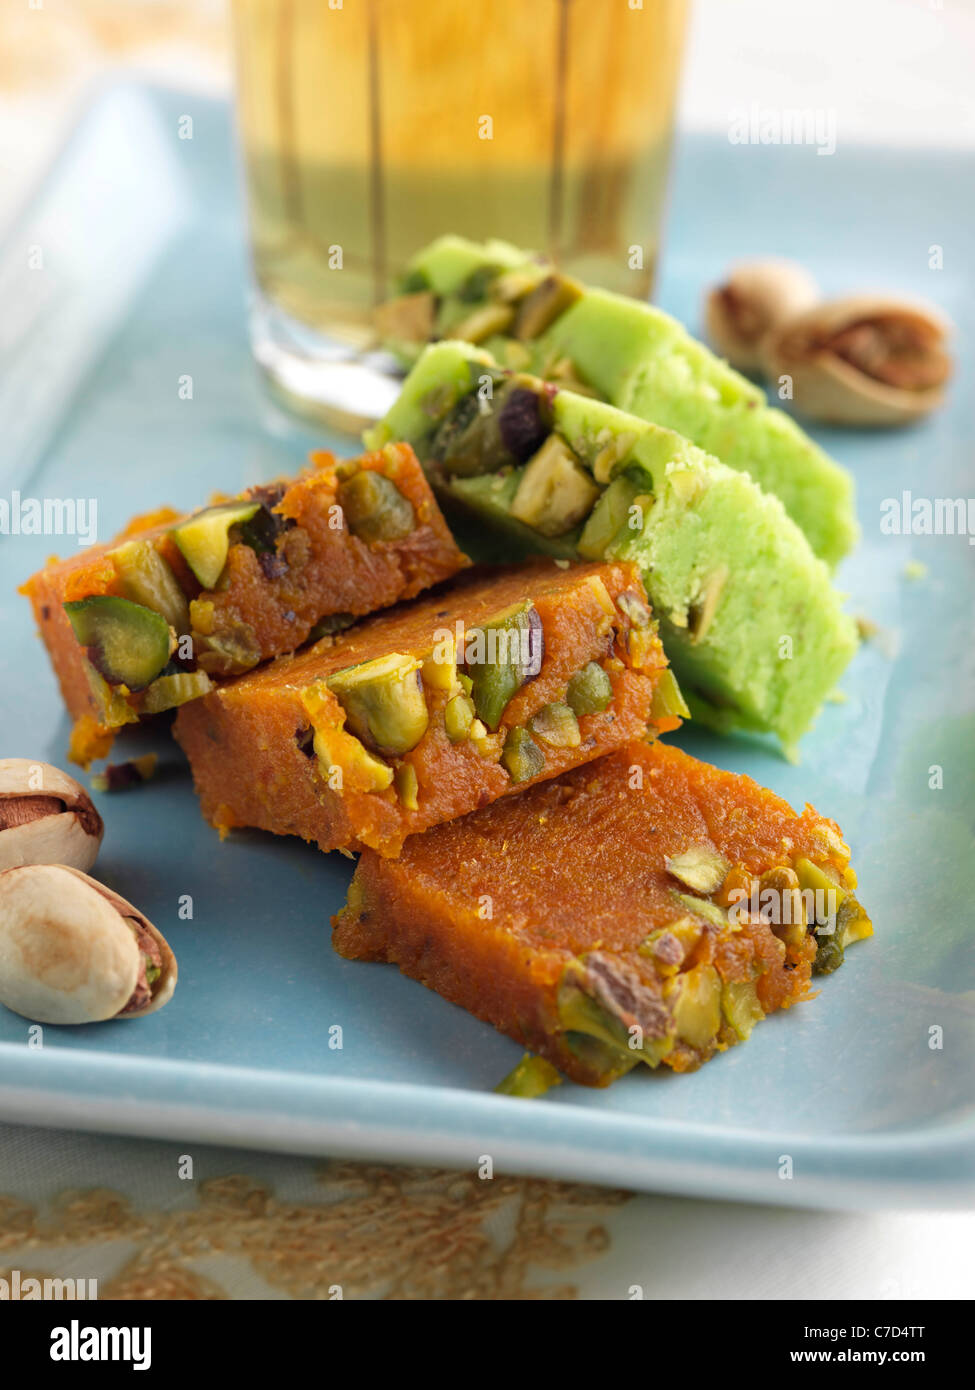 Pakistani confection - Stock Image